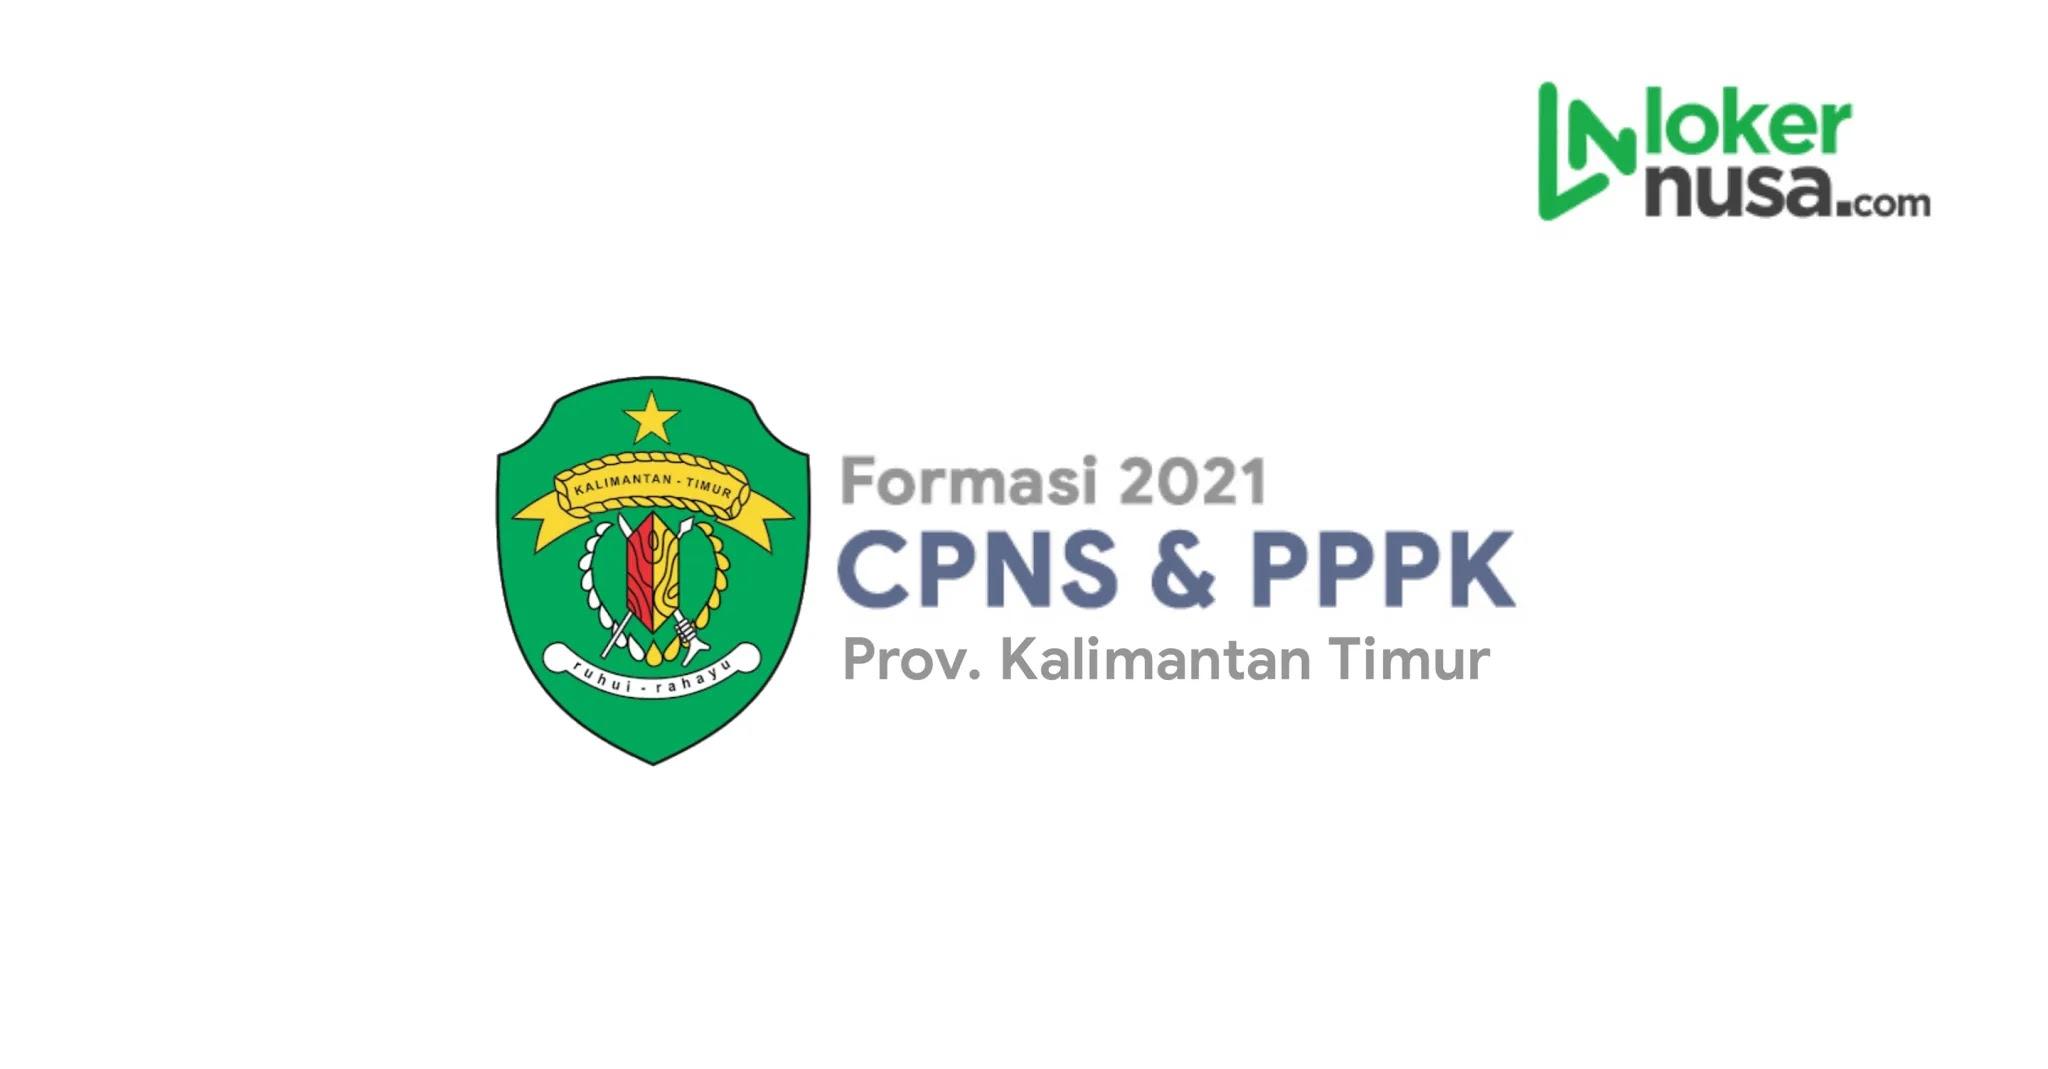 CPNS Kalimantan Timur